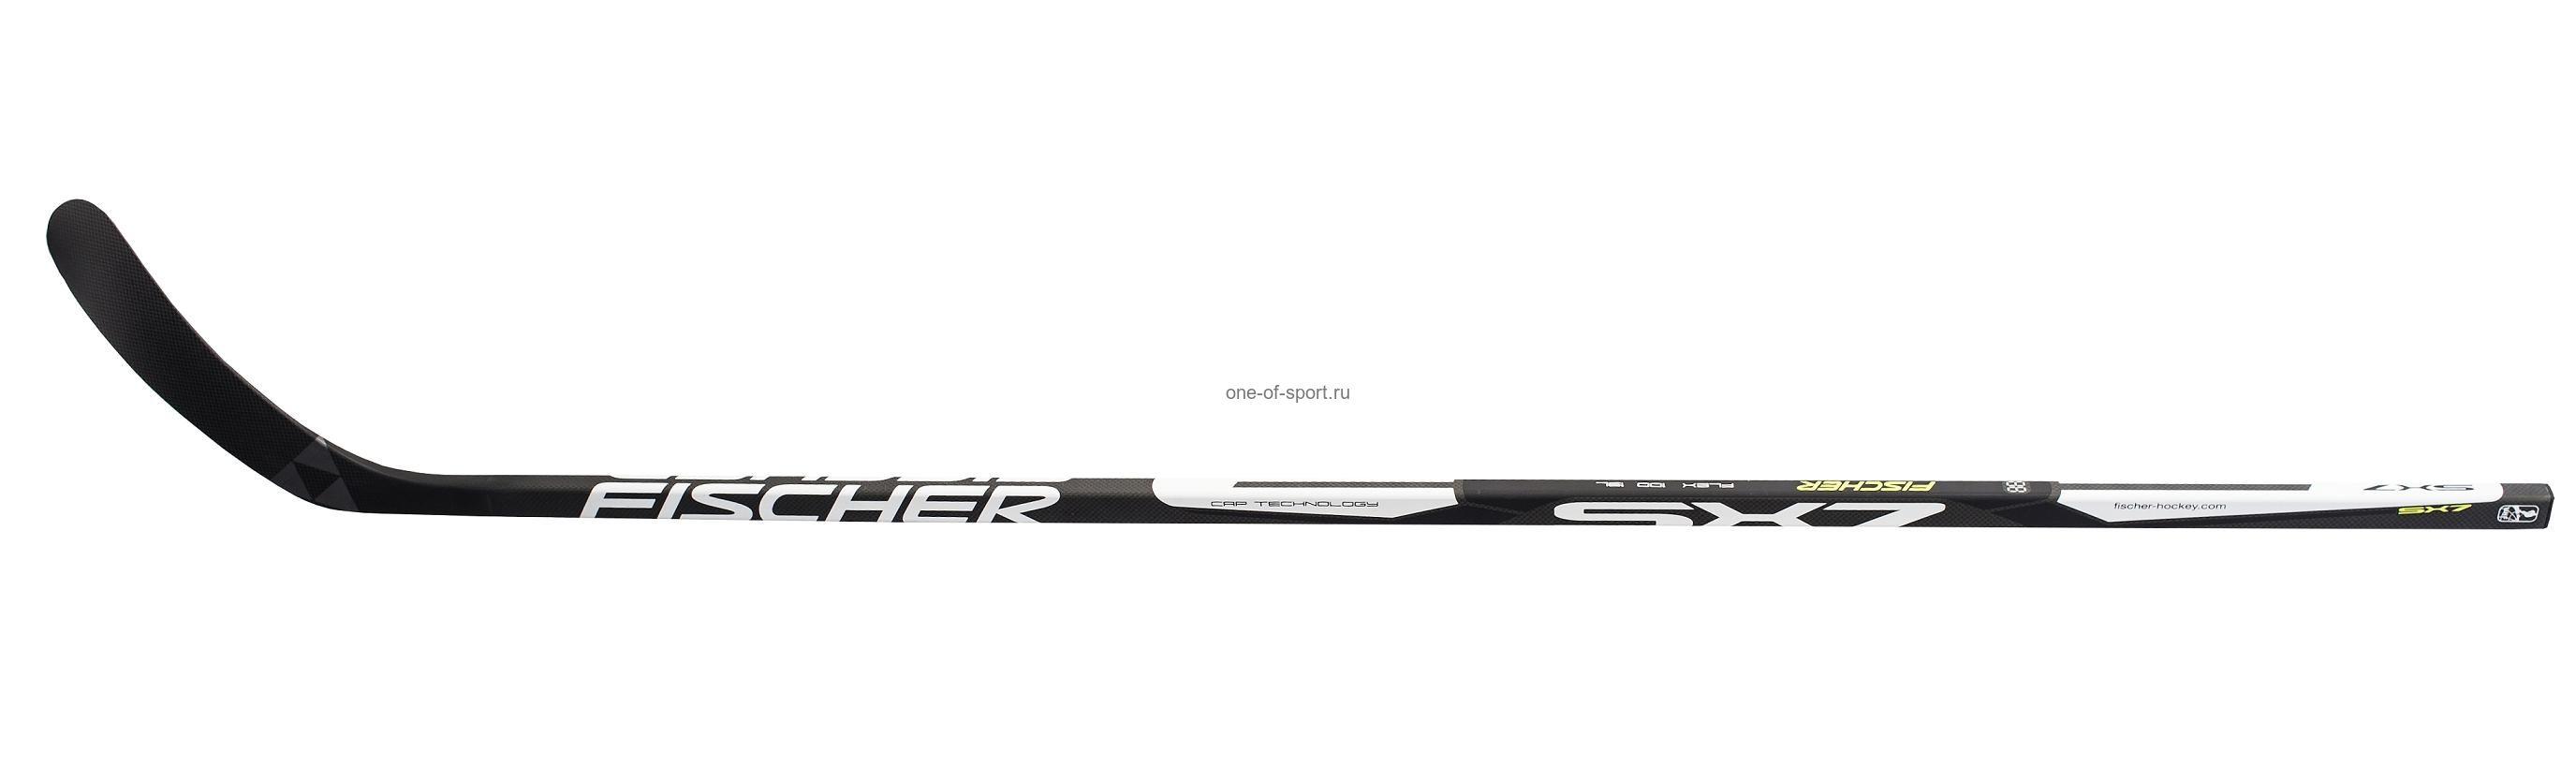 Клюшка хоккейная Fischer SX7 100 Matt SR арт.H11314